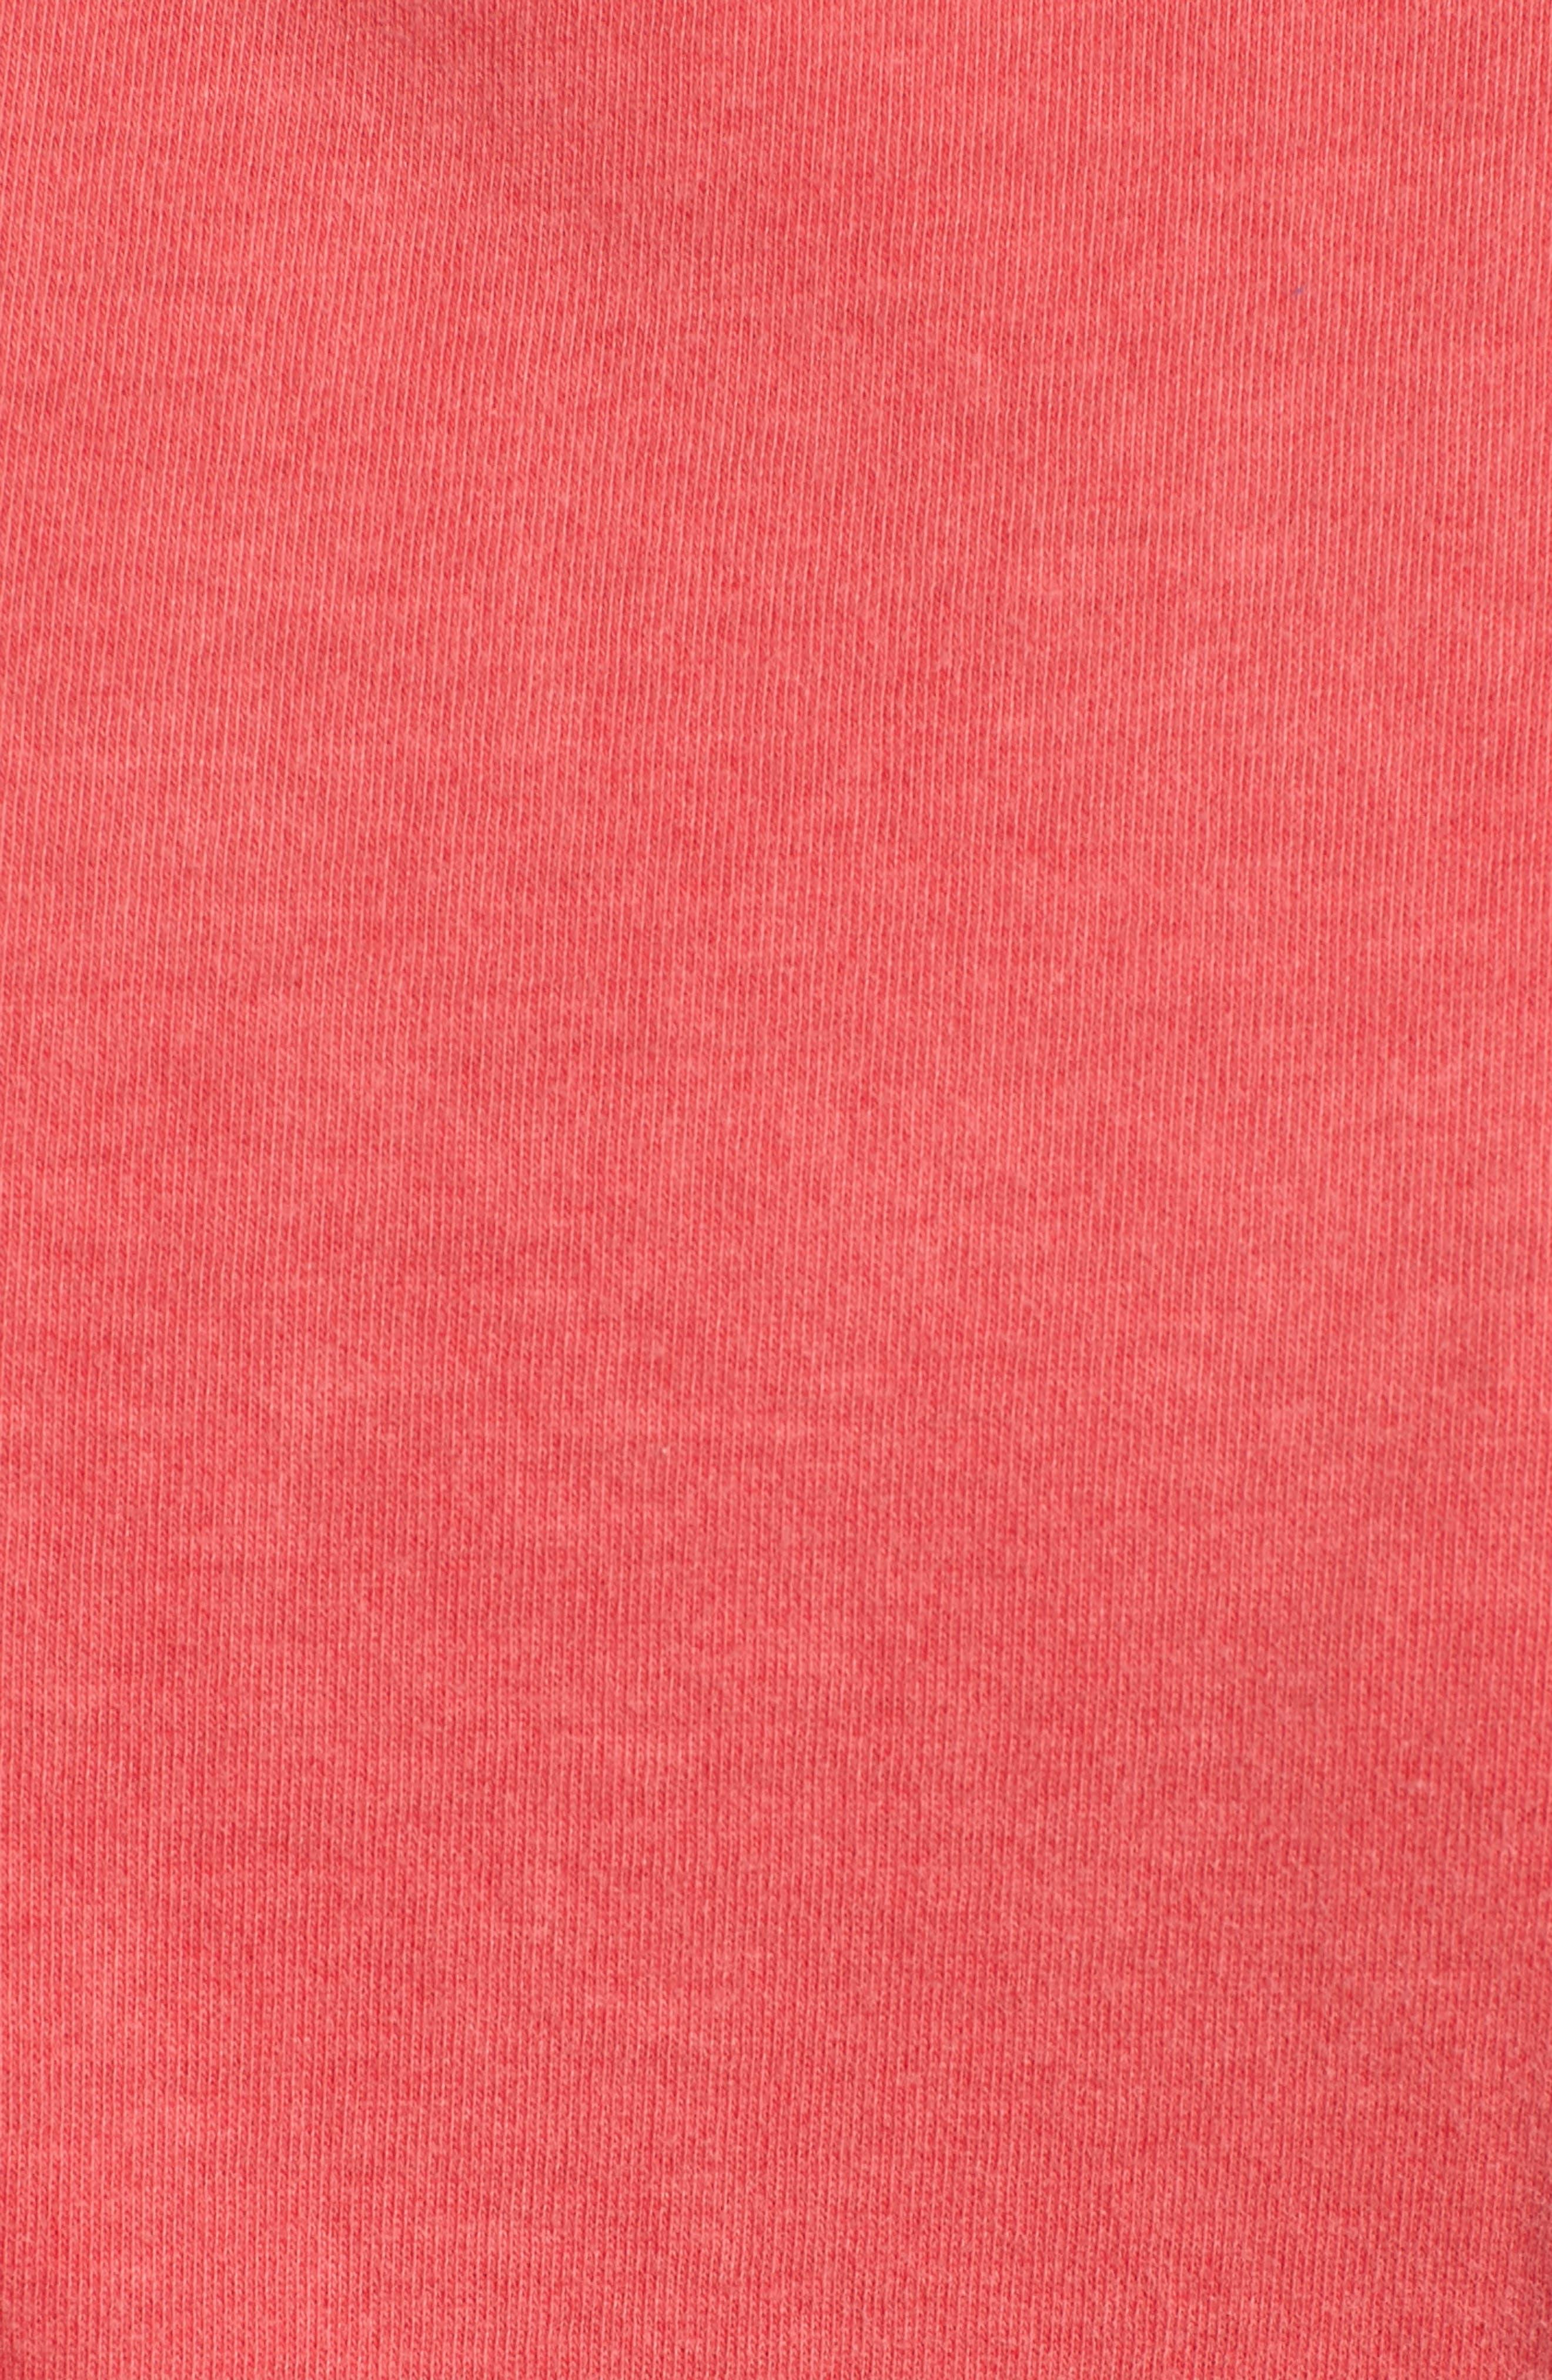 Twist Jersey Dress,                             Alternate thumbnail 6, color,                             SCARLET